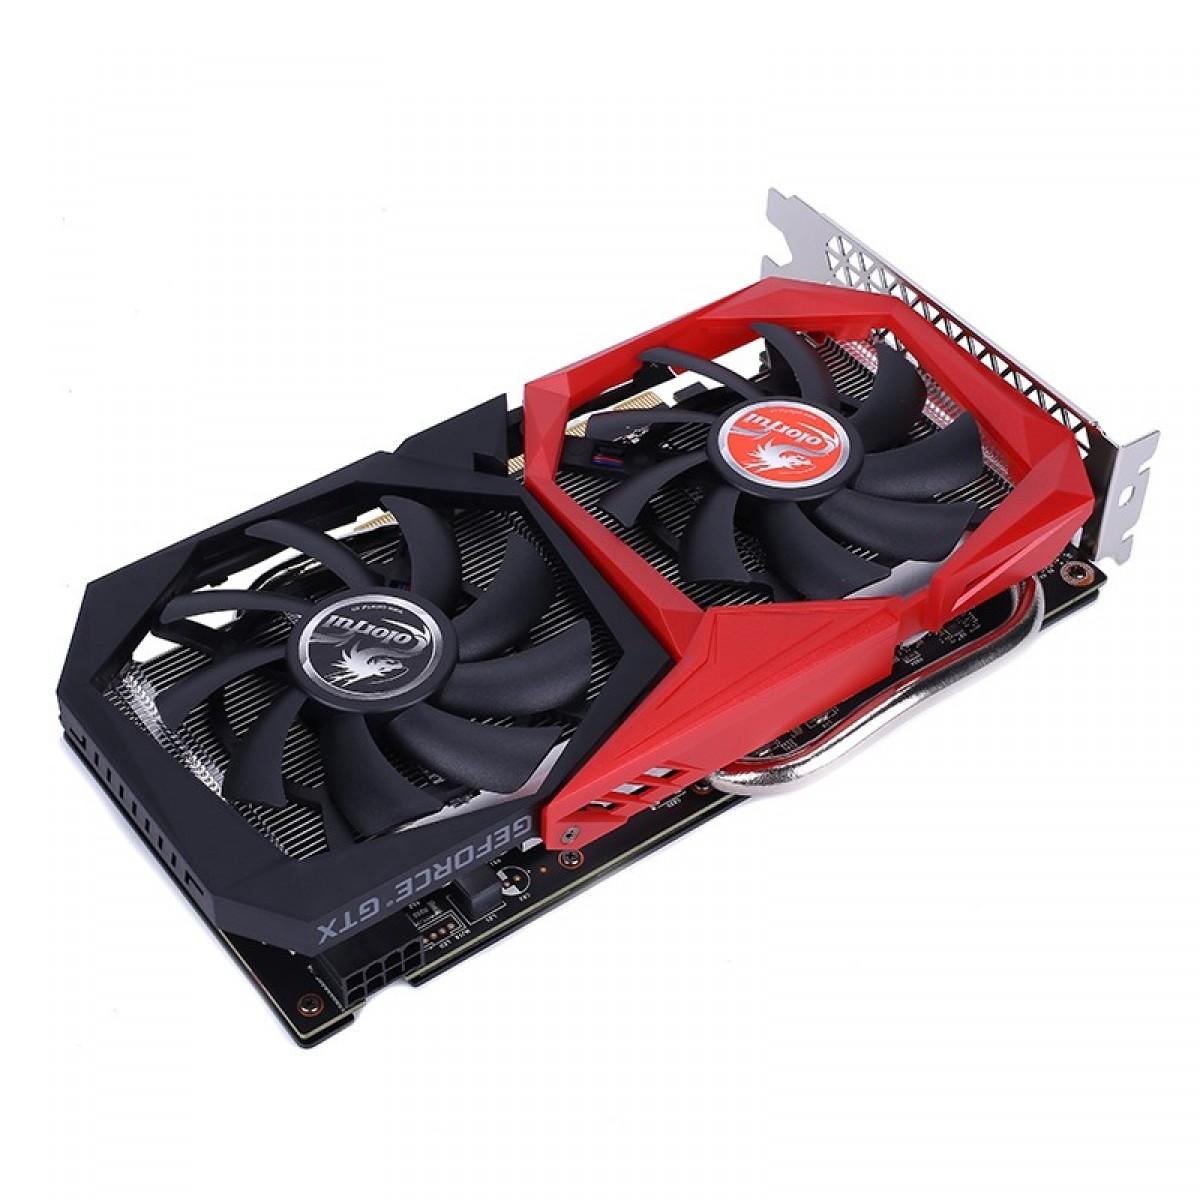 Placa de Vídeo Colorful GeForce GTX 1660 Super NB 6G-V, 6GB GDDR6, 192Bit